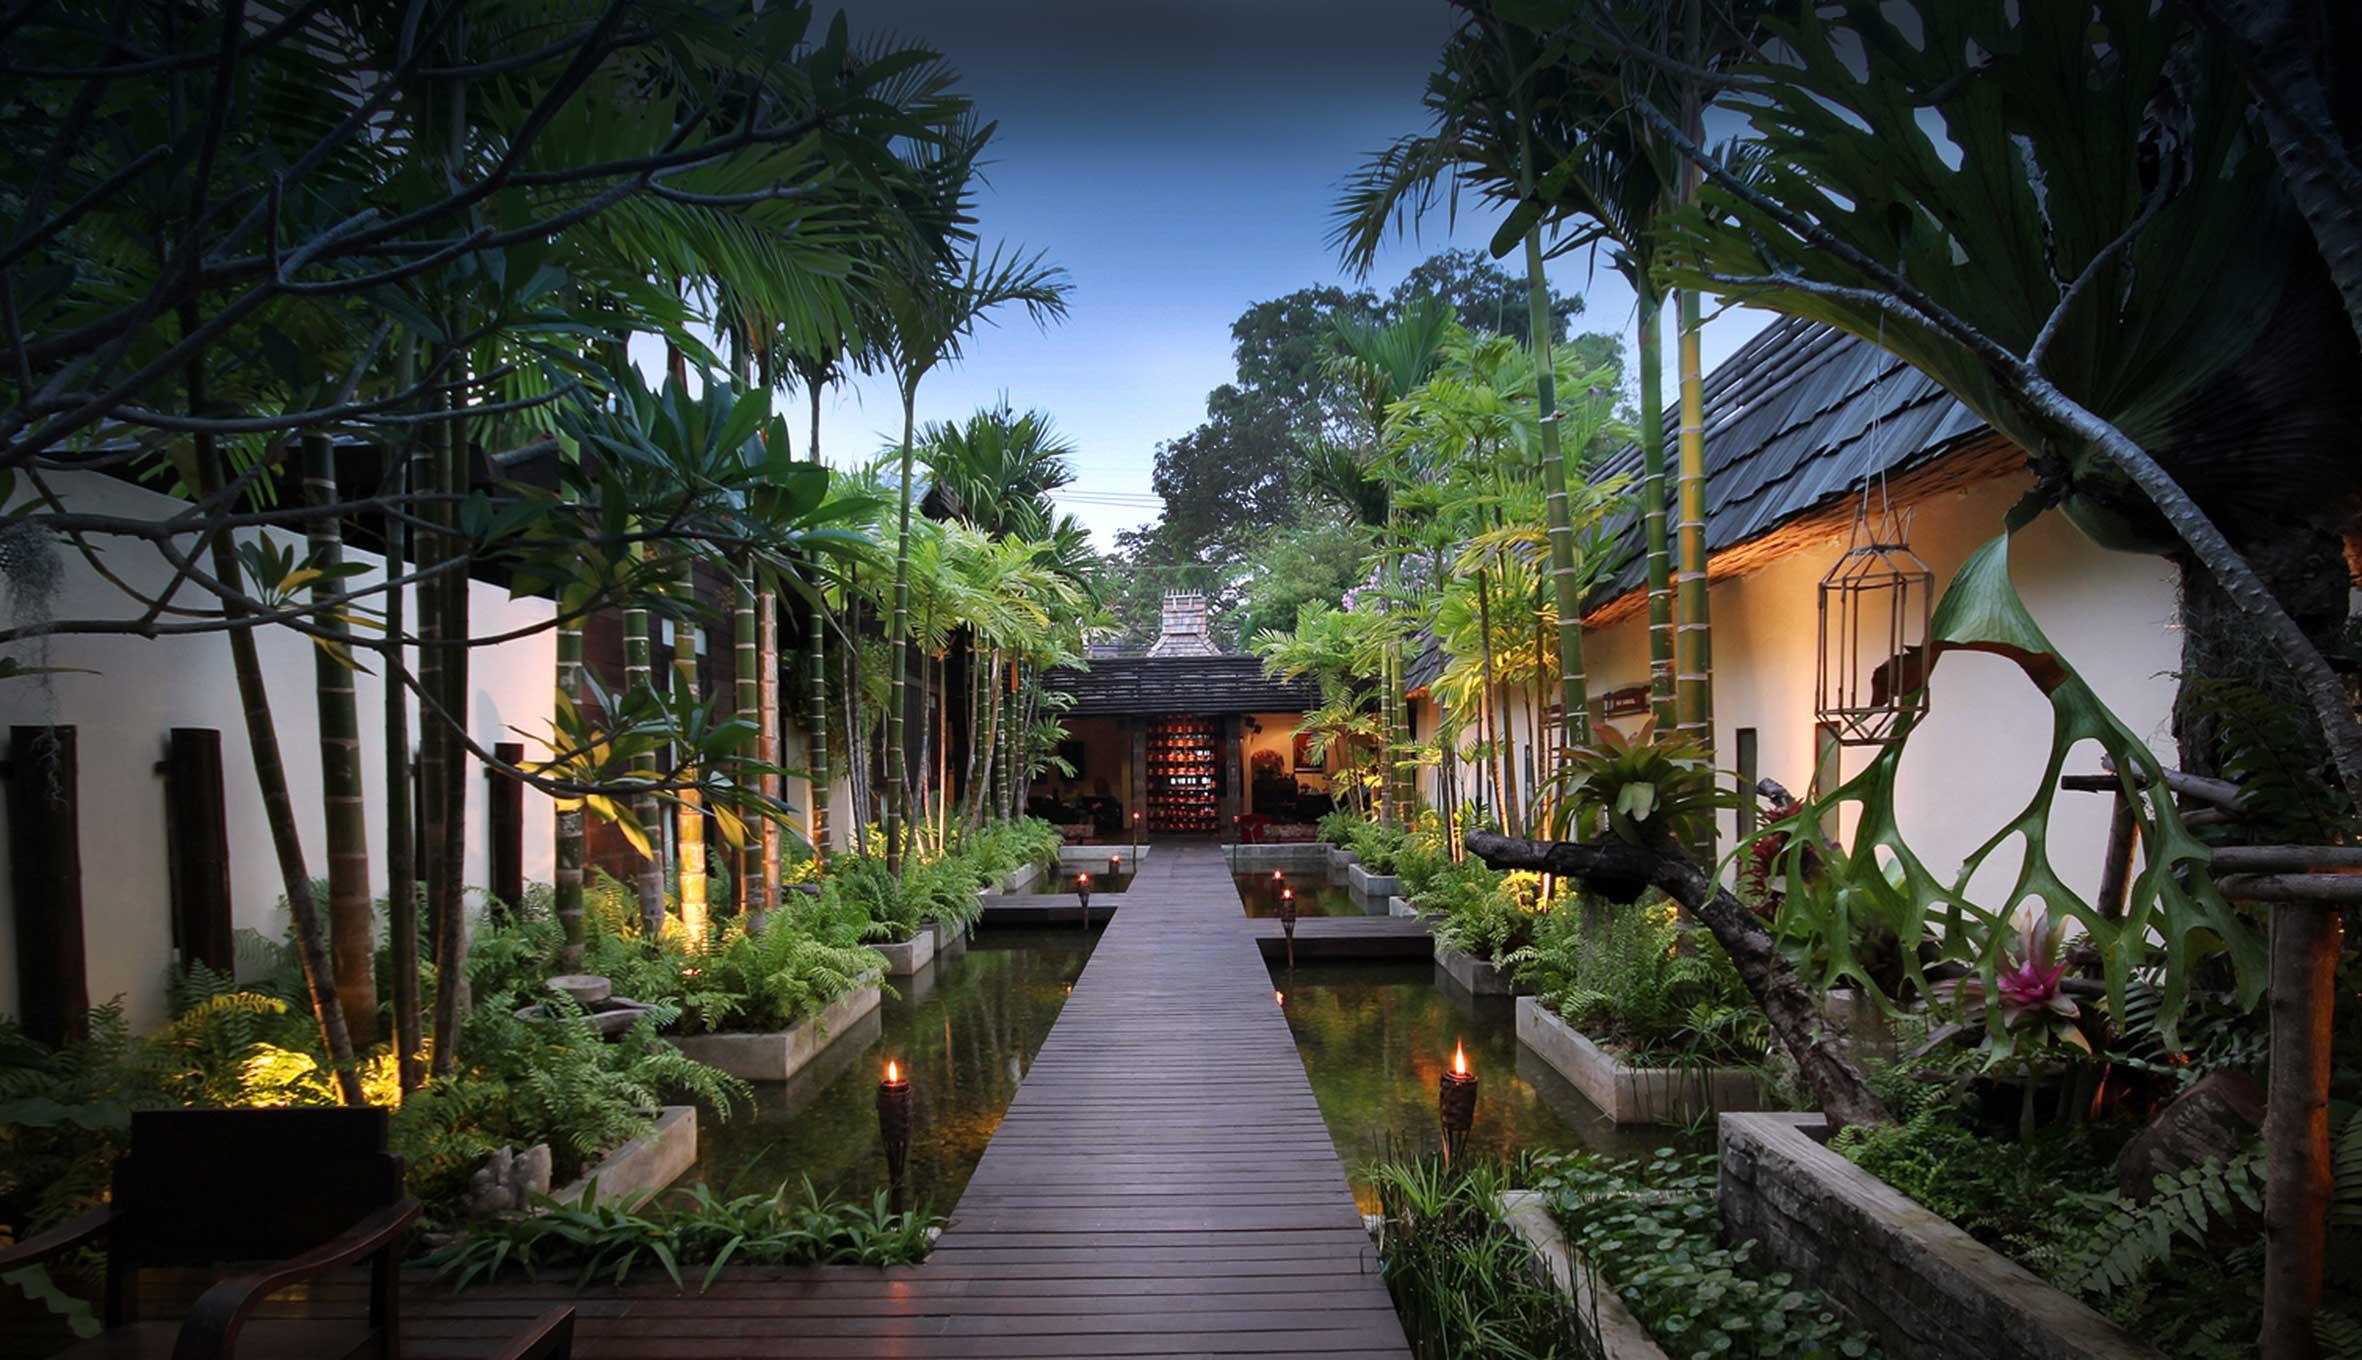 Fah Lanna Spa & Massage | Chiang Mai, Thailand